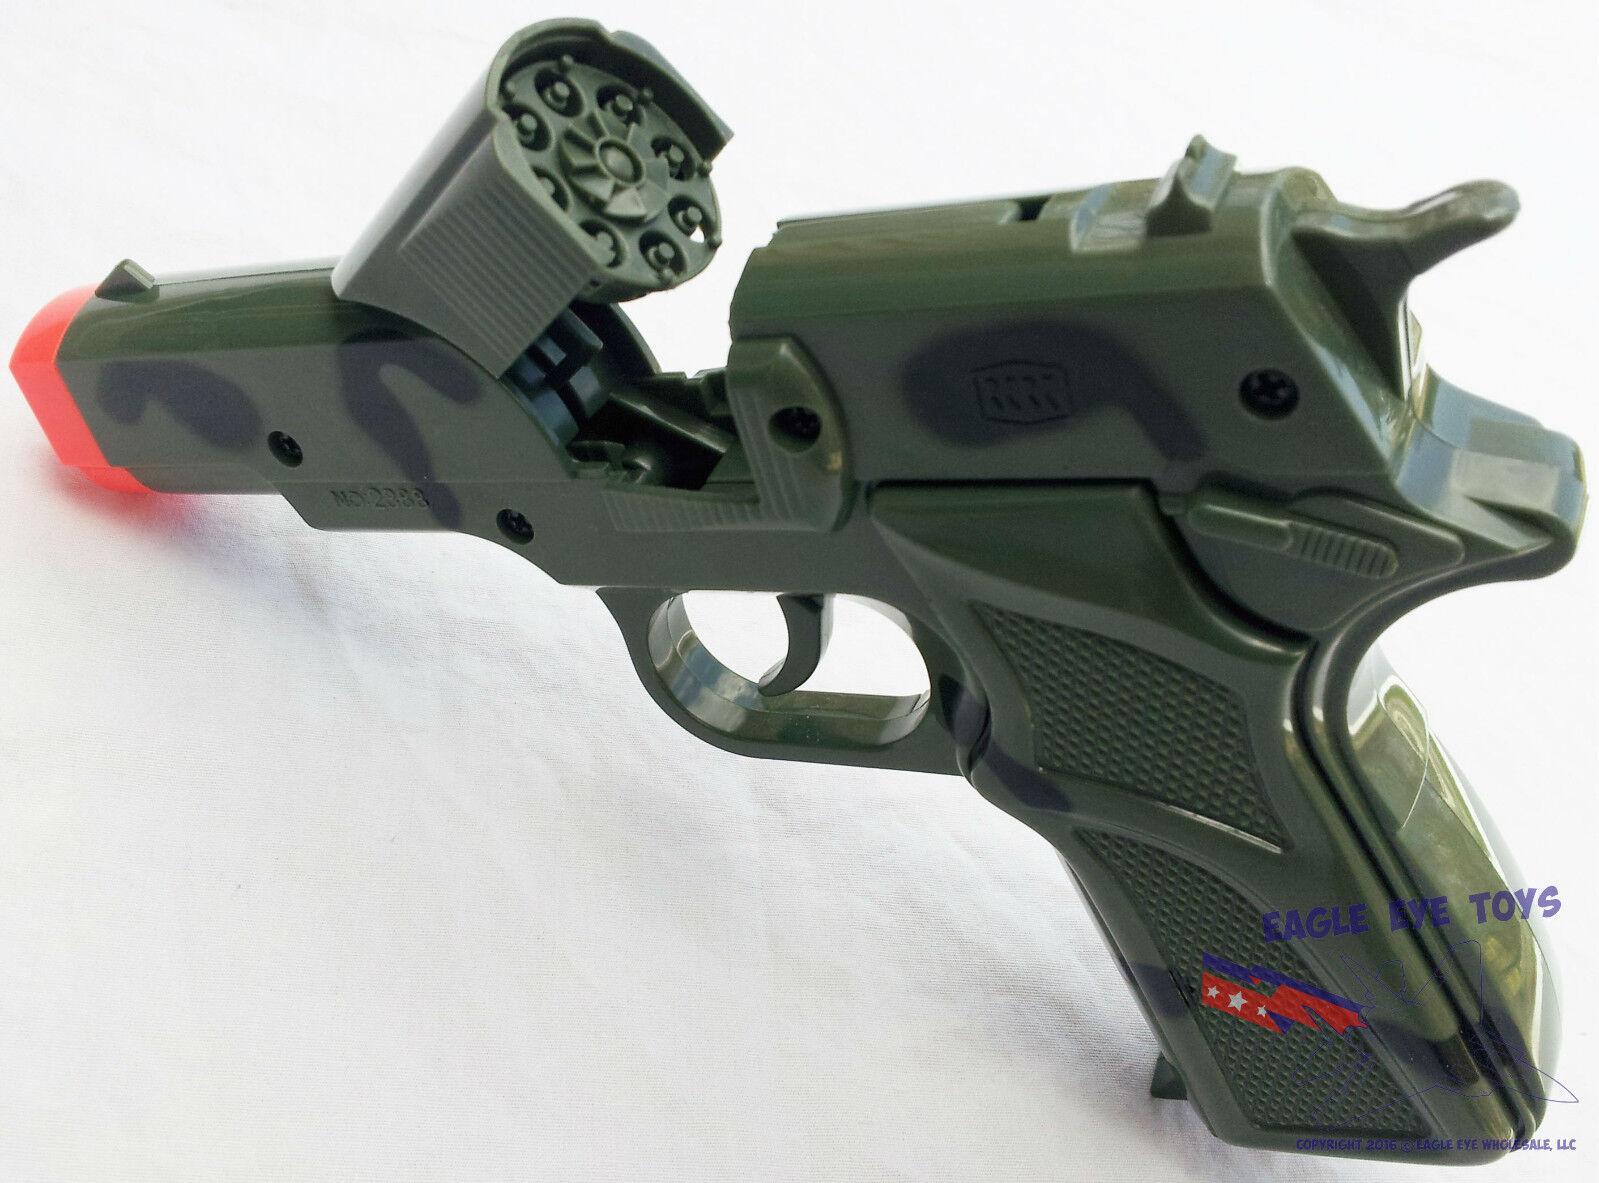 Toy Gun Military Detective 9MM Pistol Cap Guns - CAMO